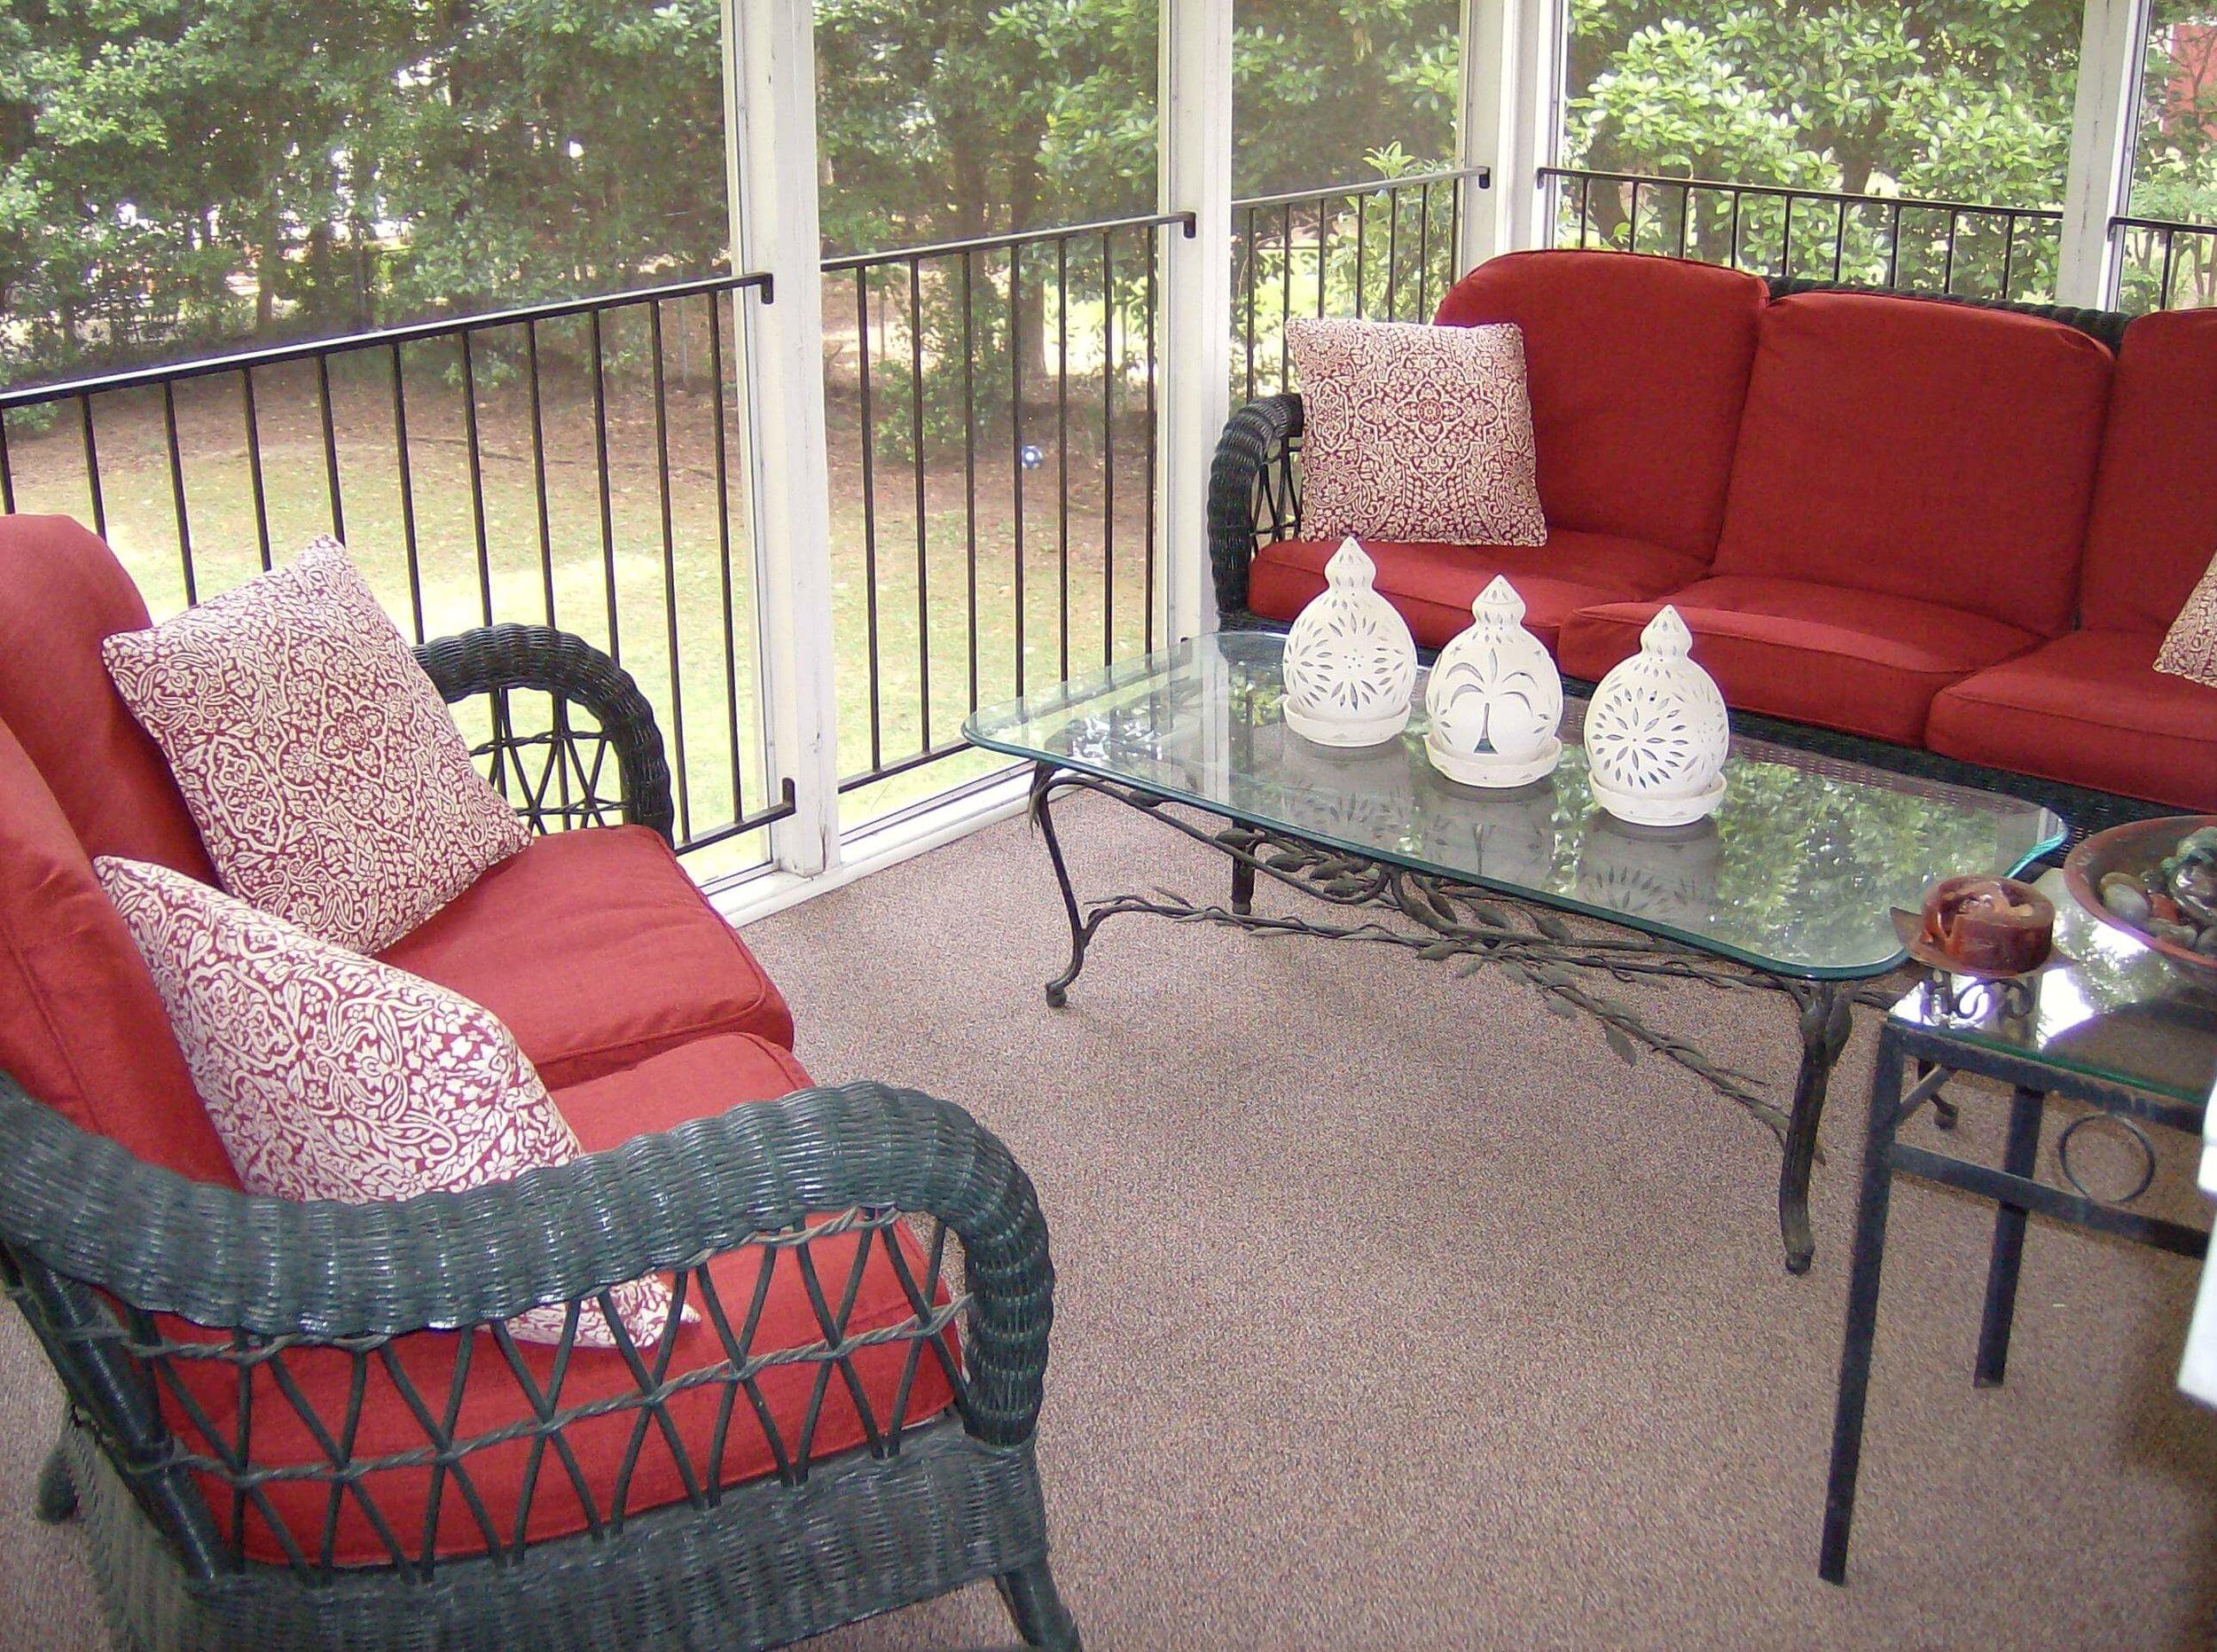 custom-furniture-upholstery-design-atlanta-georgia-9.JPG